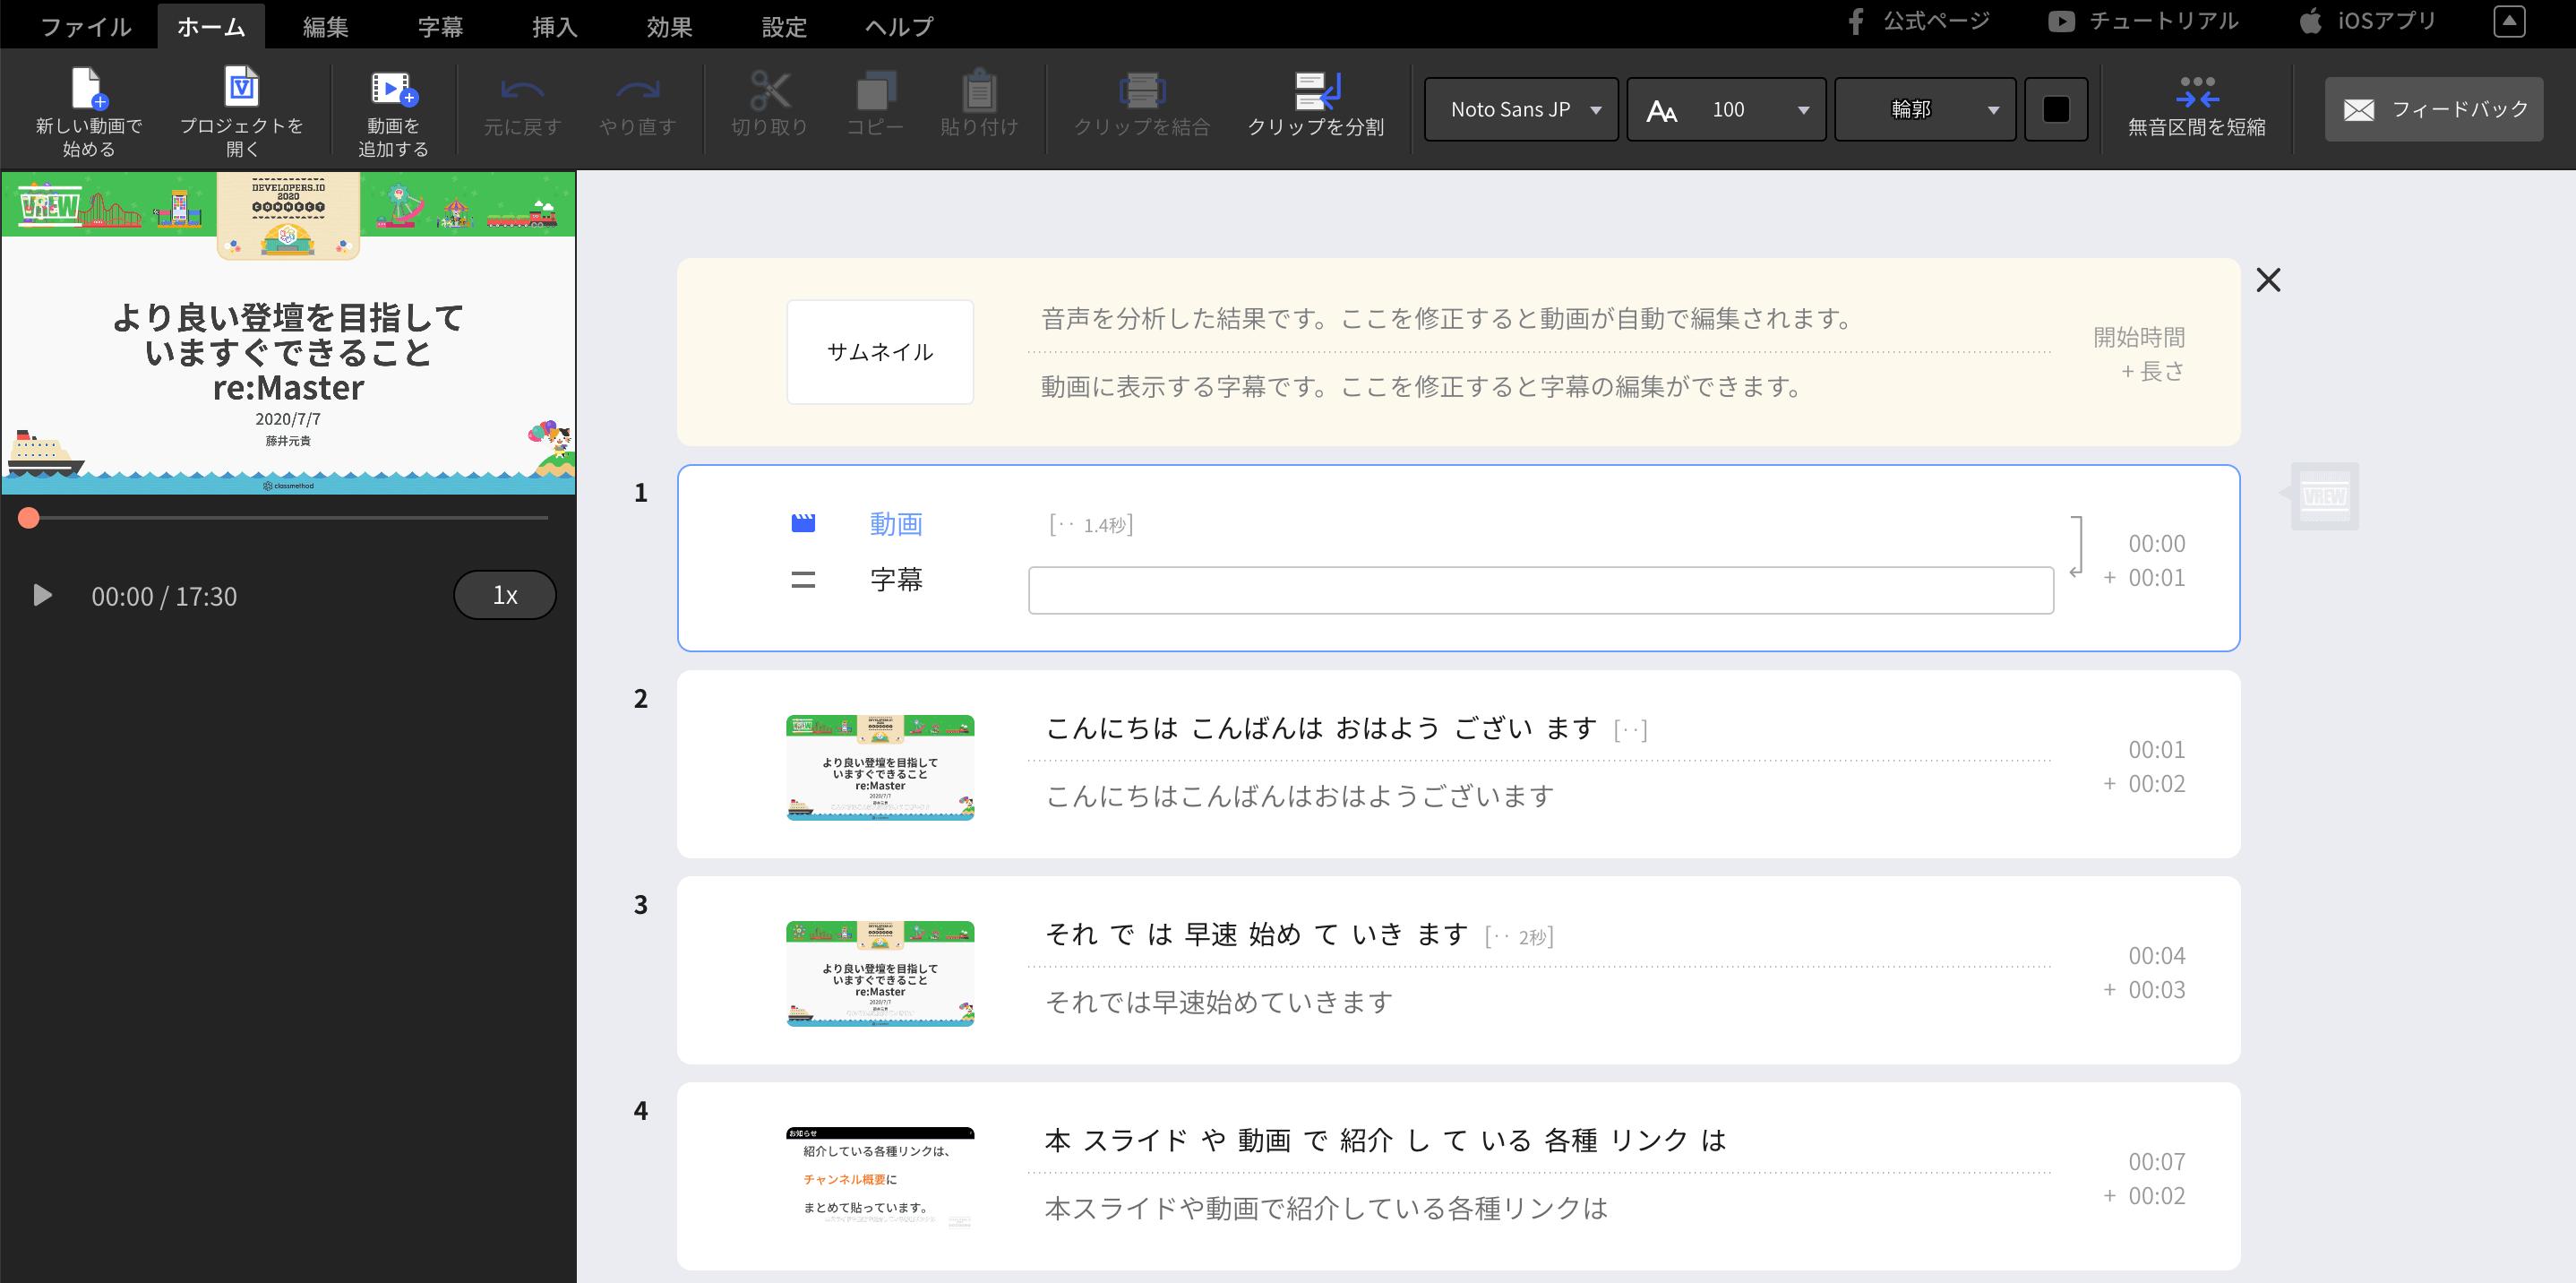 字幕 Vrew